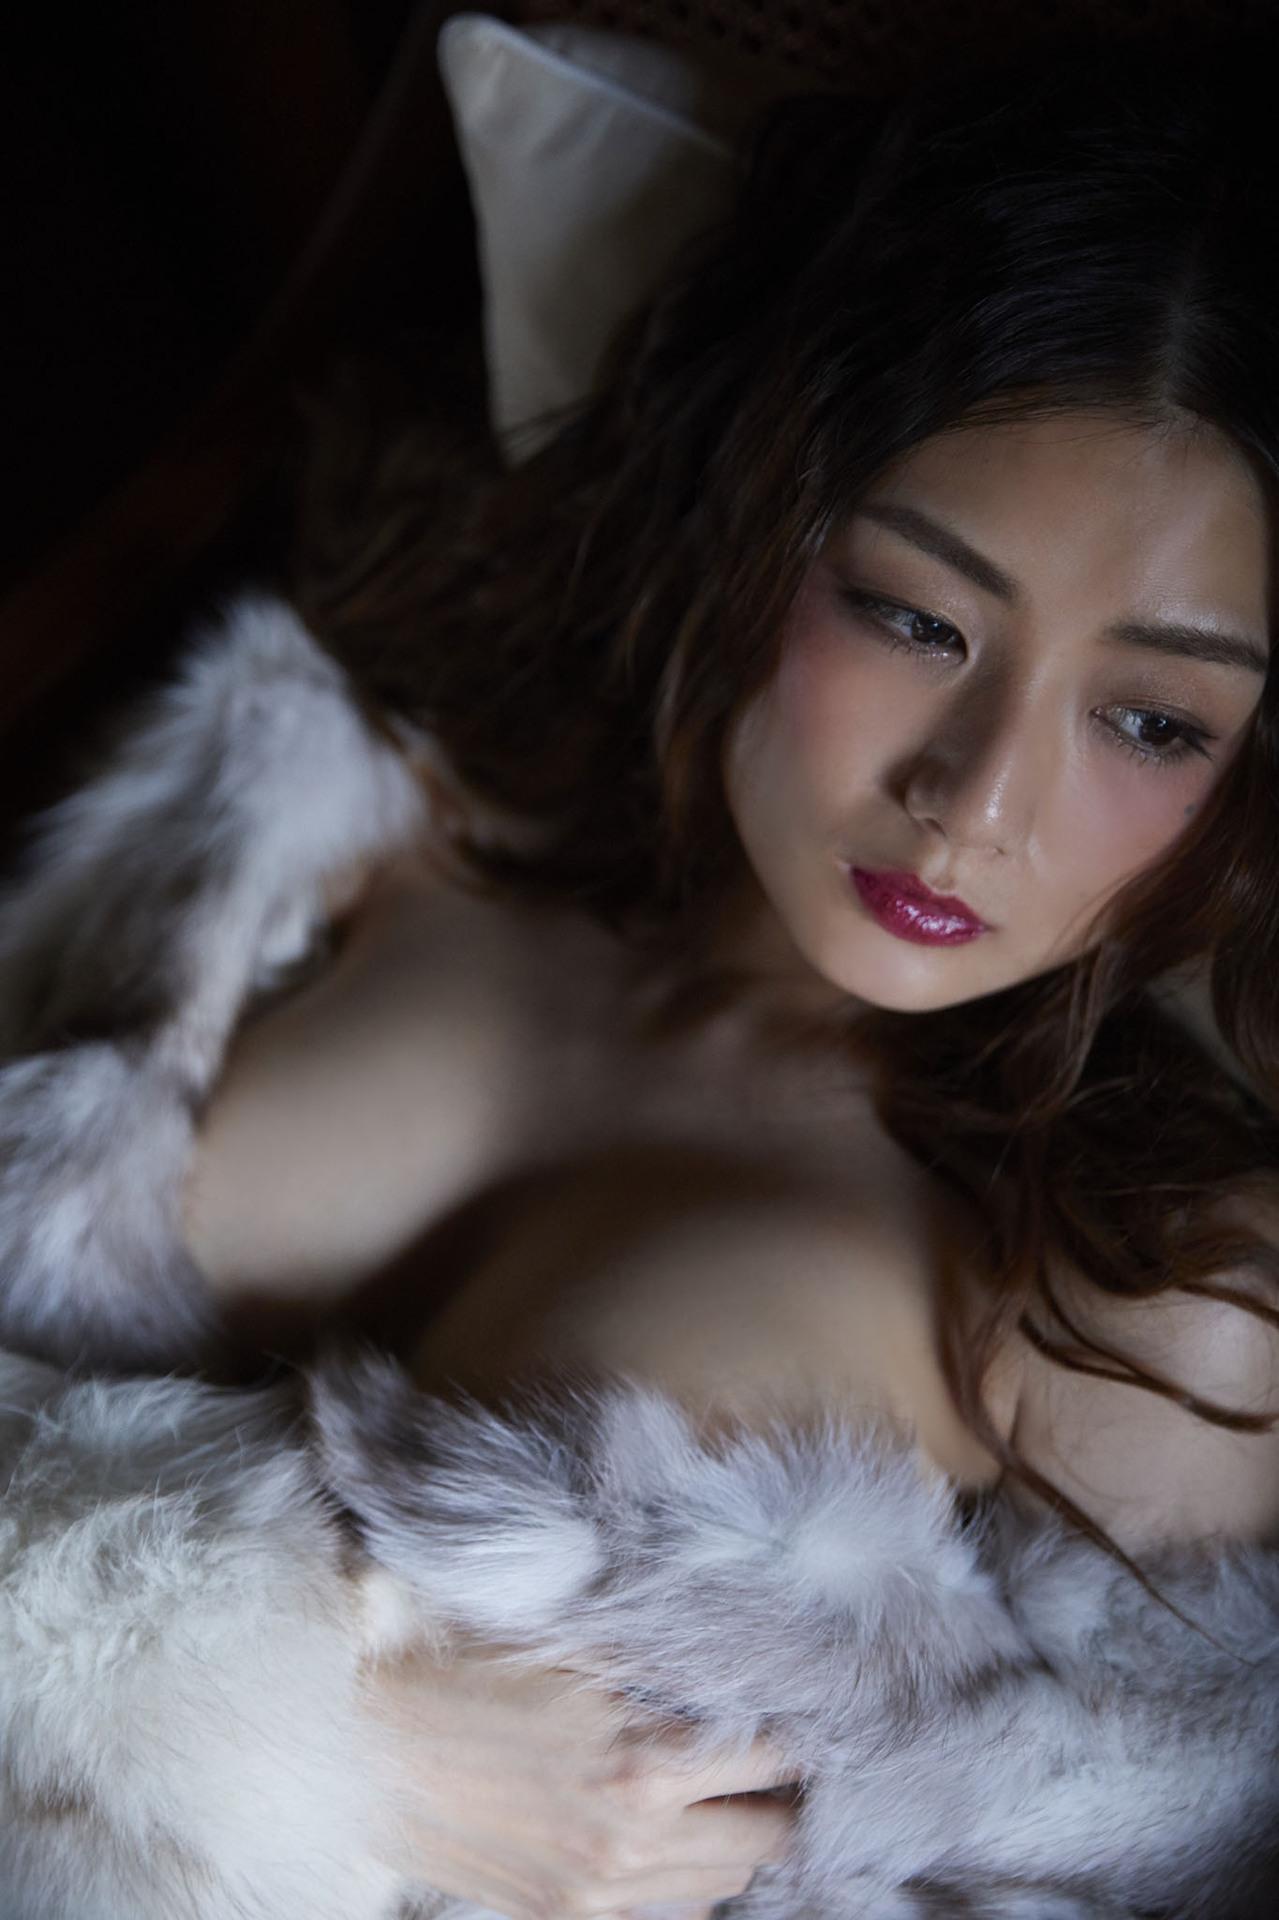 片山萌美 Poker Face 00031